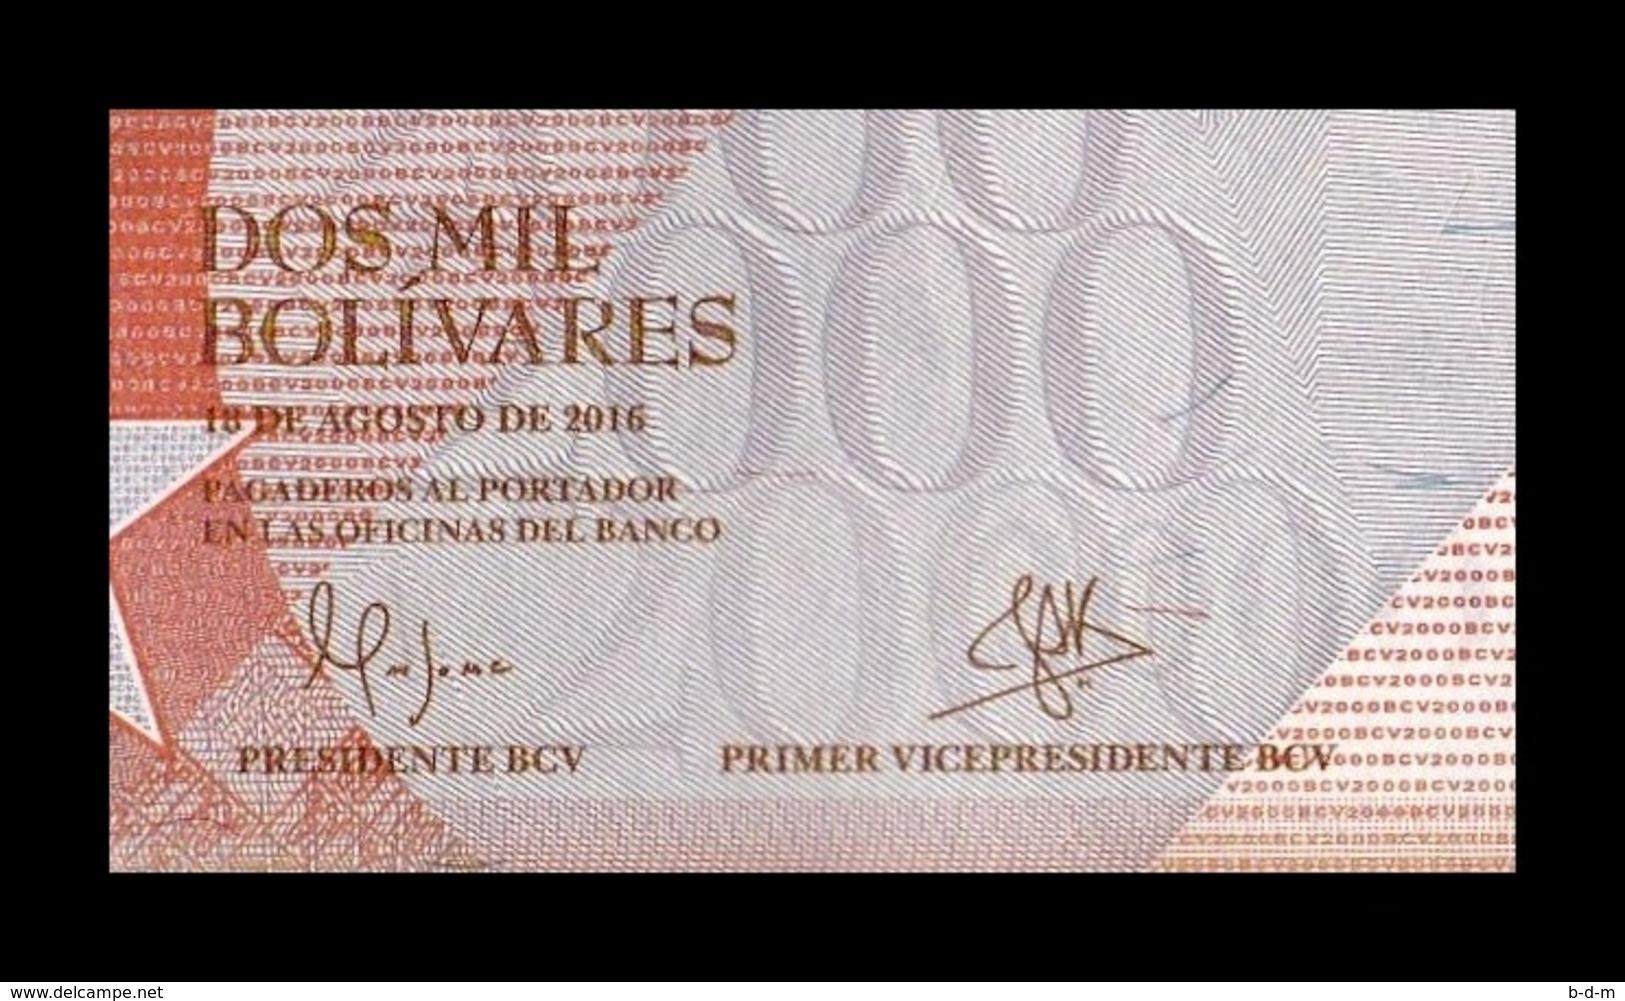 Venezuela 2000 Bolívares 2016 Pick 96 Sign 1 SC UNC - Venezuela